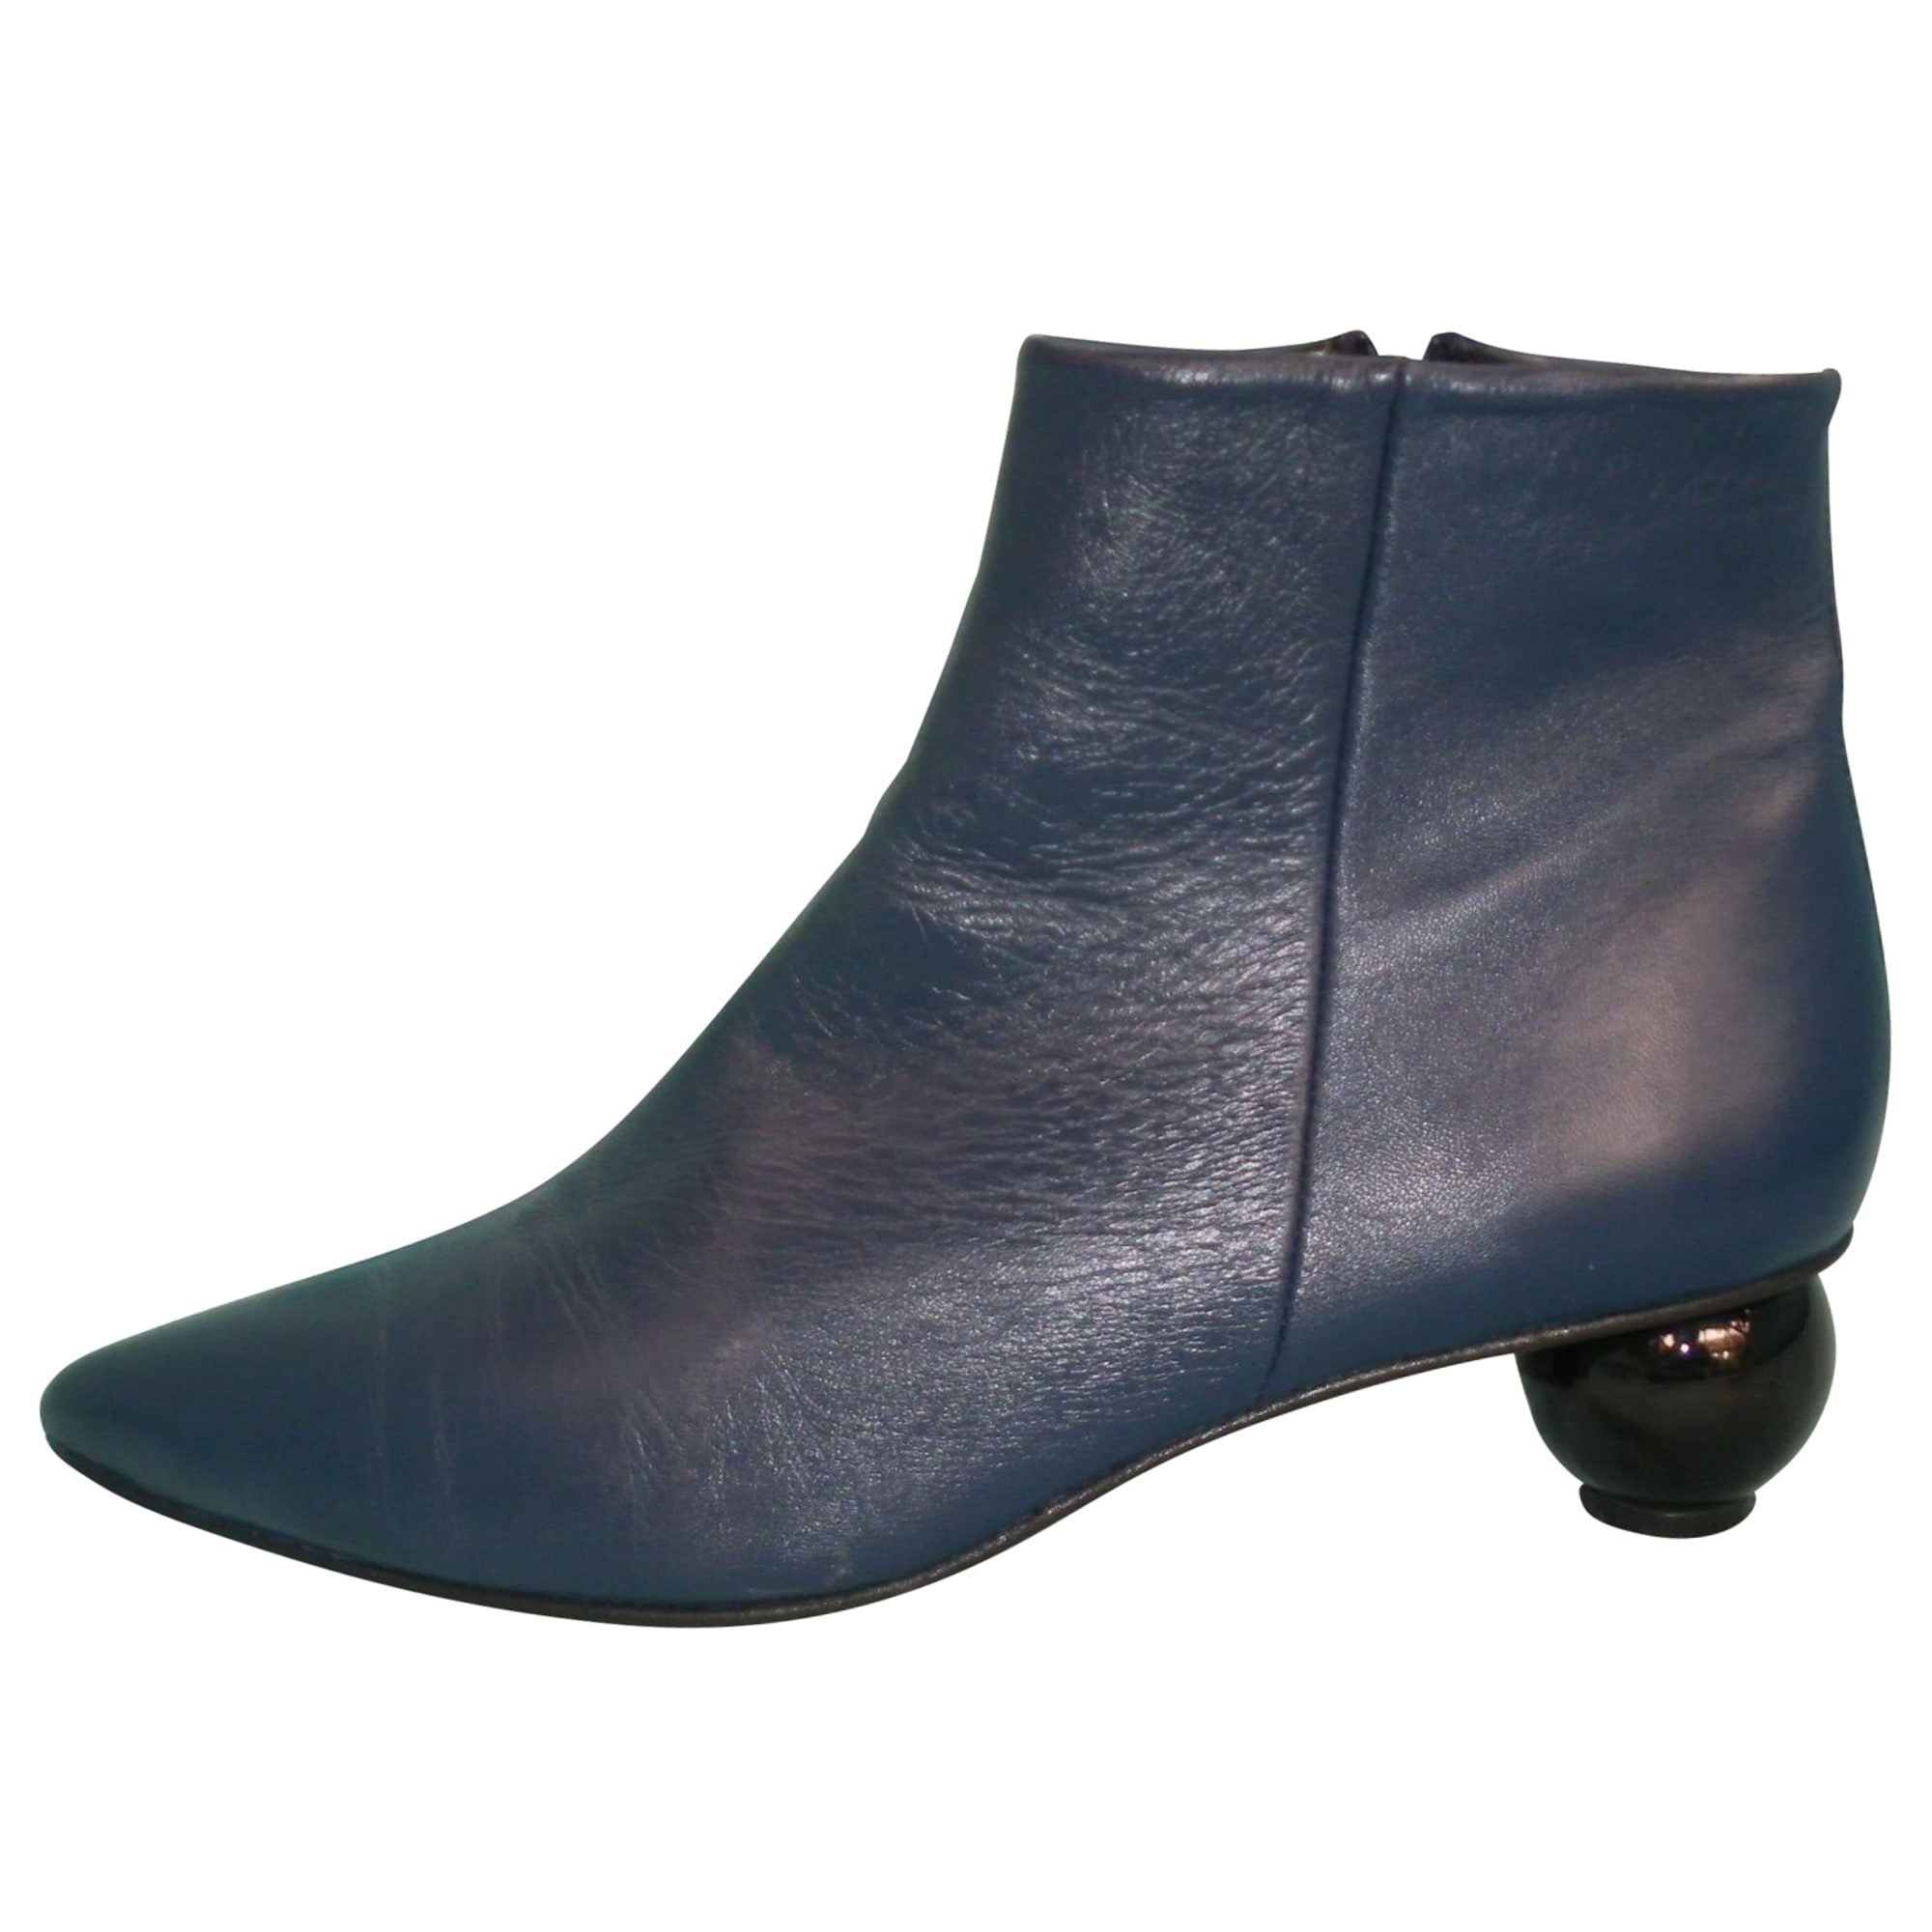 Bottines & low boots à talons CAREL Bleu, bleu marine, bleu turquoise